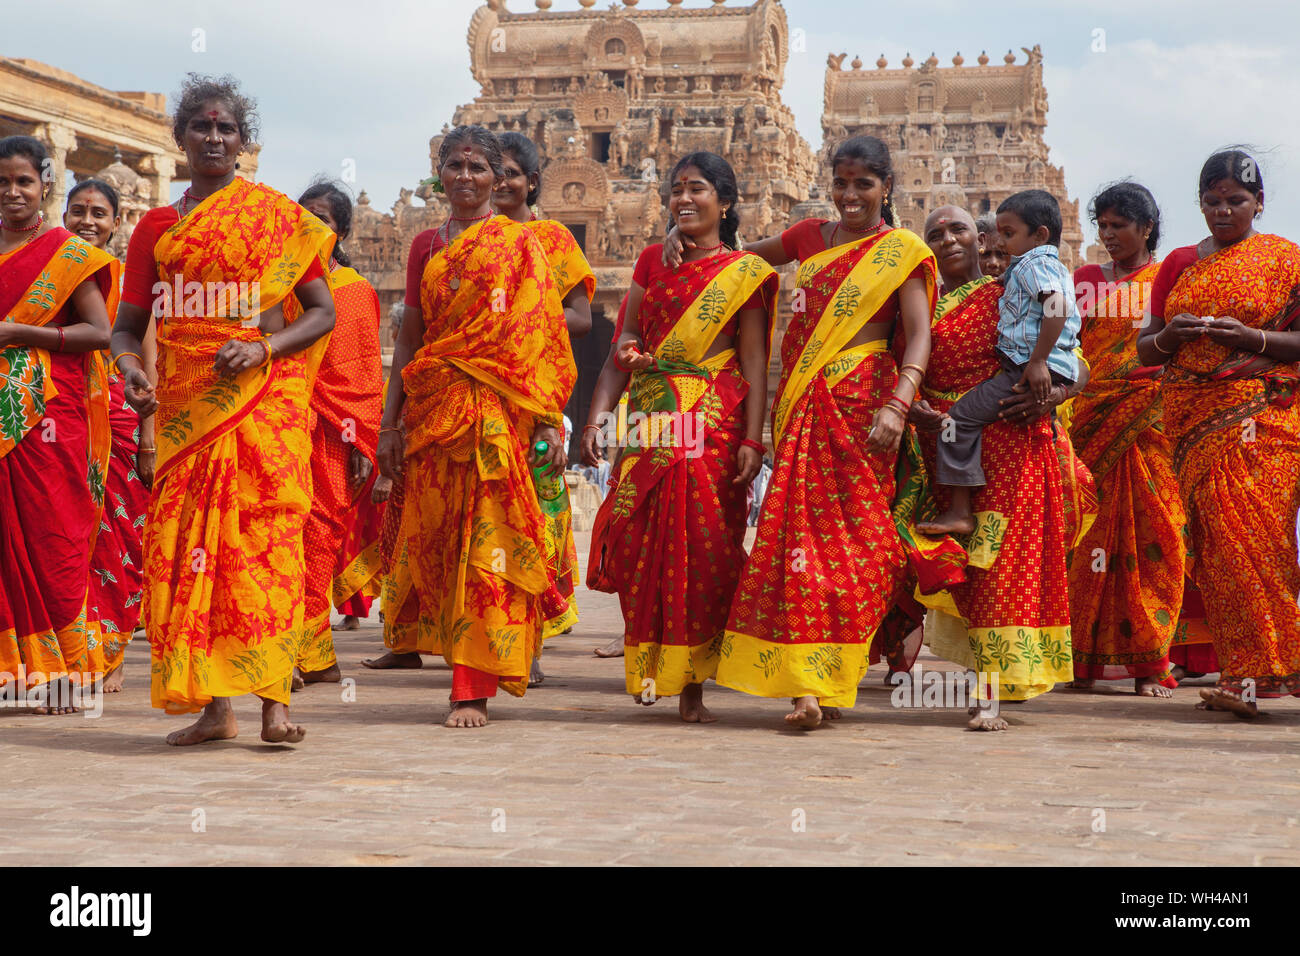 India, Tamil Nadu, Tanjore, Thanjavur, Pilgrims at the